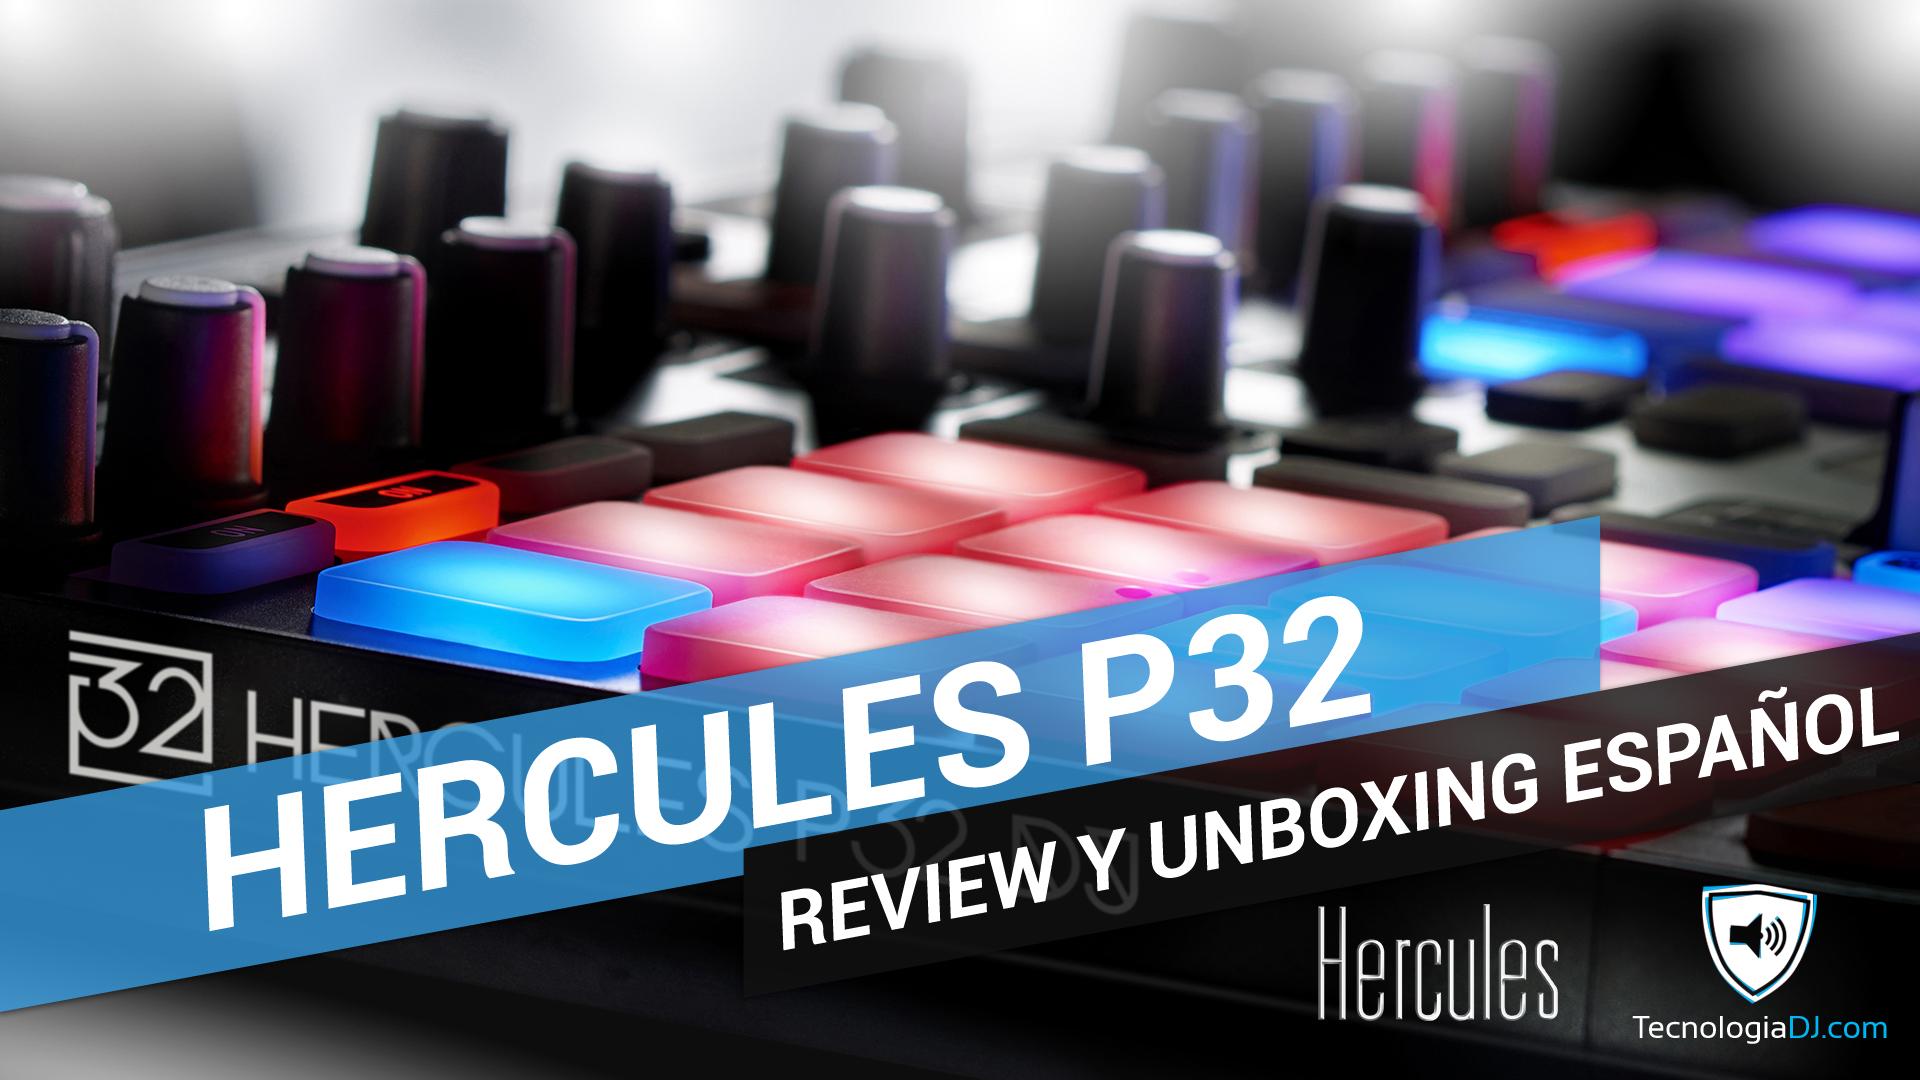 Review y unboxing en español controlador para DJ Hercules P32